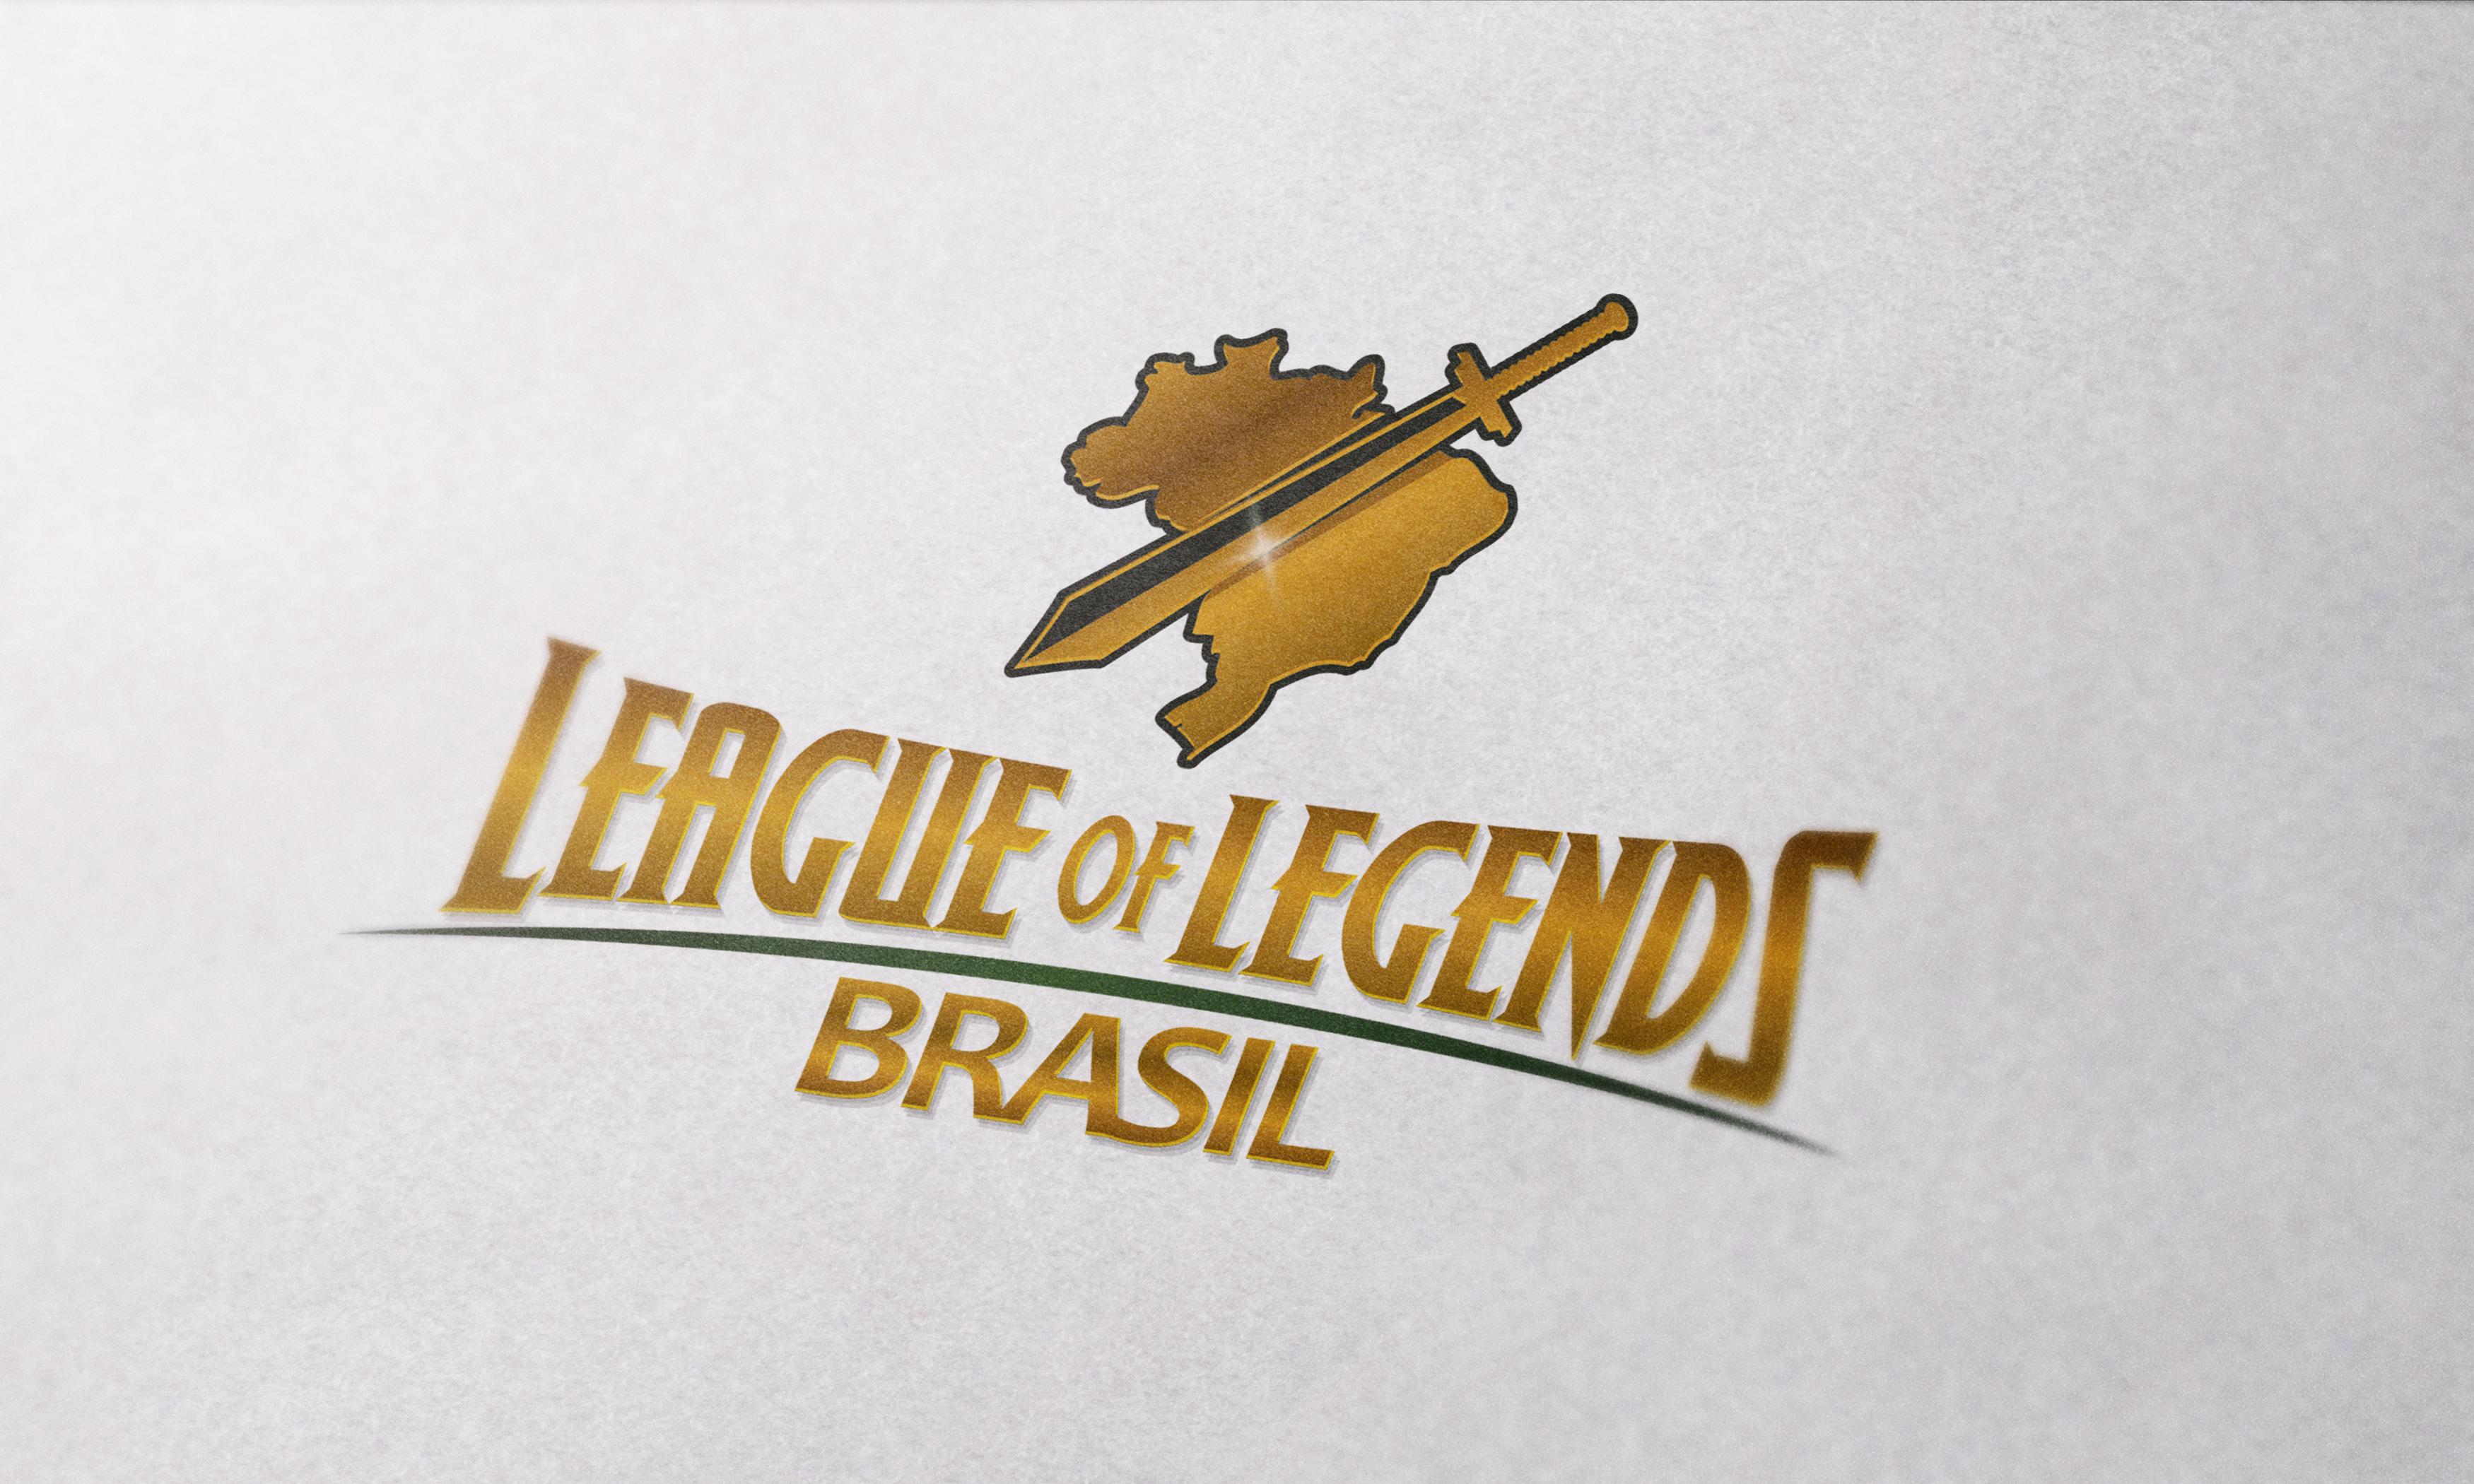 League of Legends Brazil